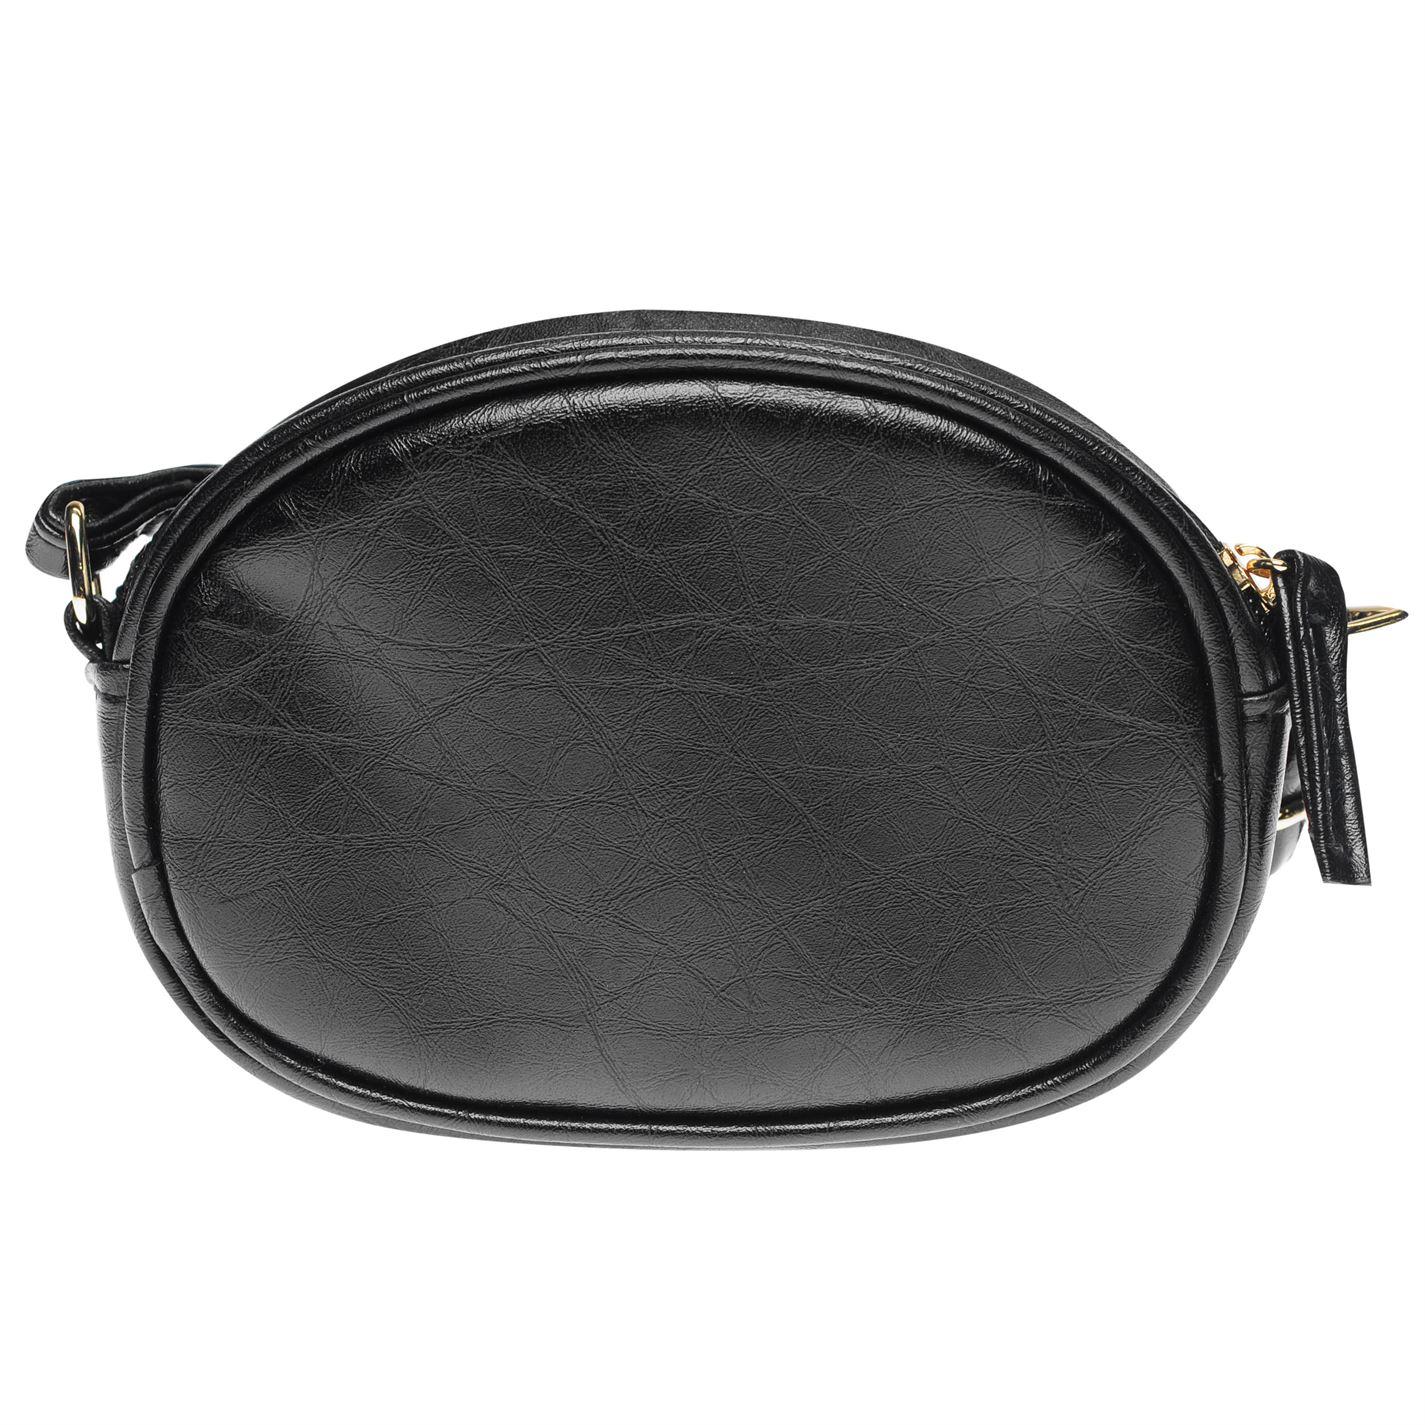 Womens-Glamorous-Lion-Shoulder-Bag-Zip-New thumbnail 4